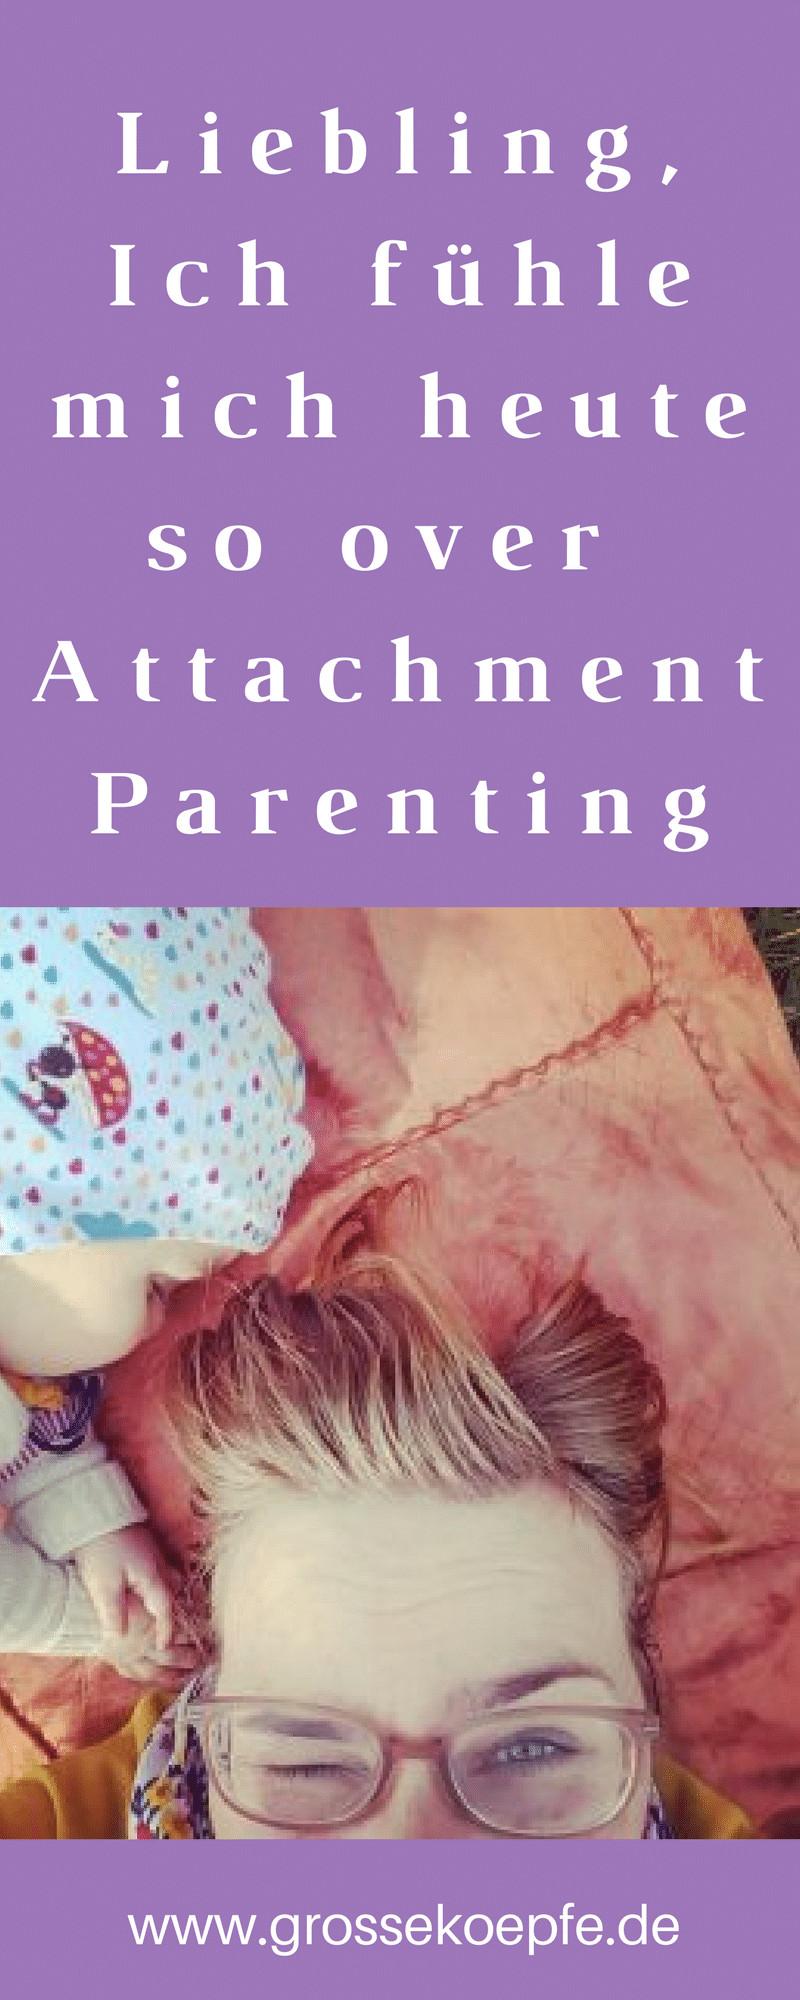 Over Attachment Parenting